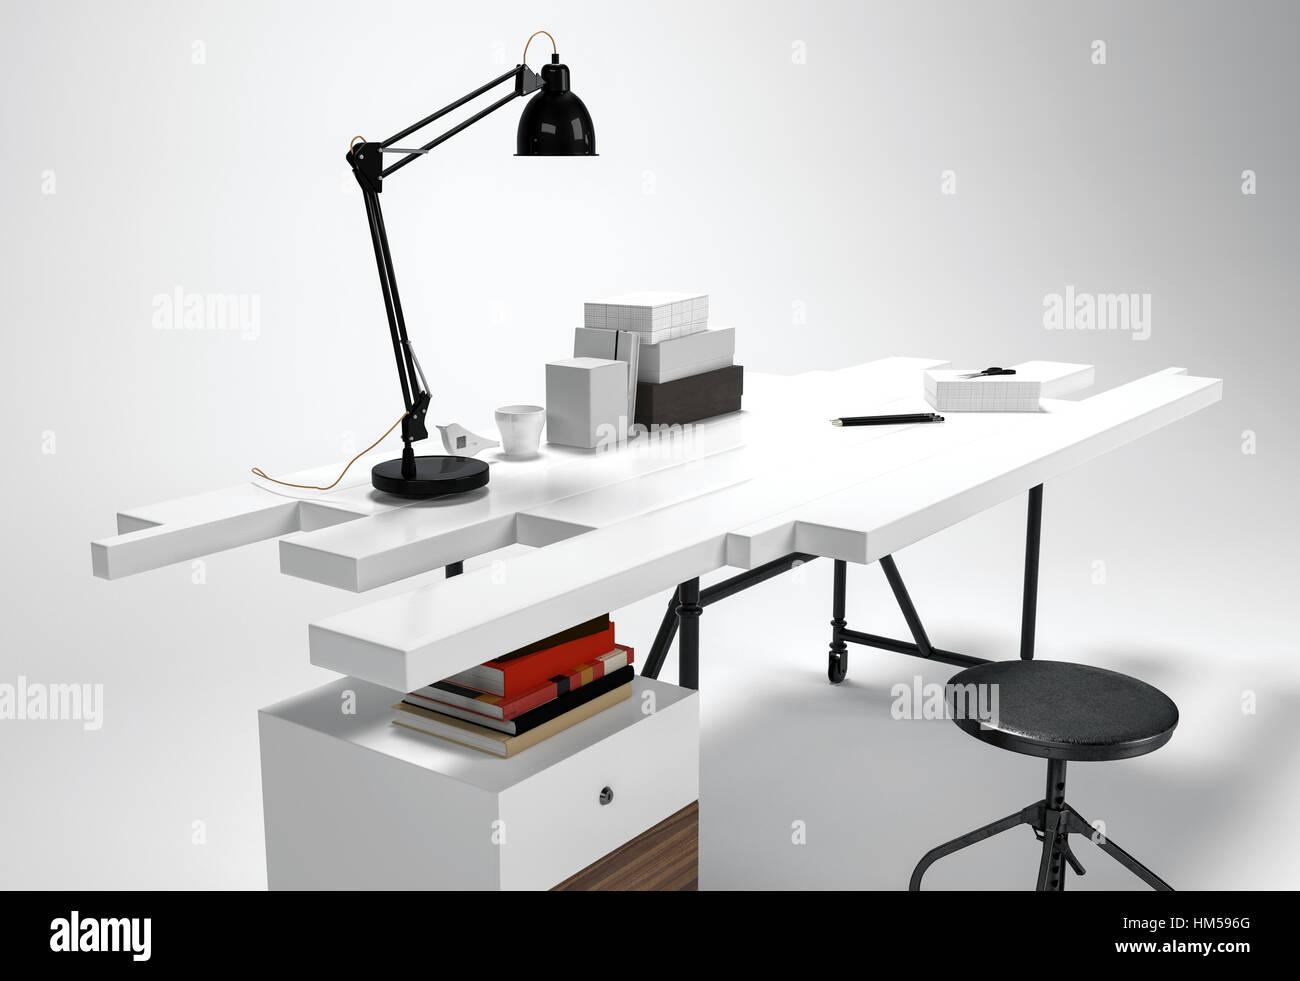 Bureau moderne blanc concept bureau avec lampe tabouret rond